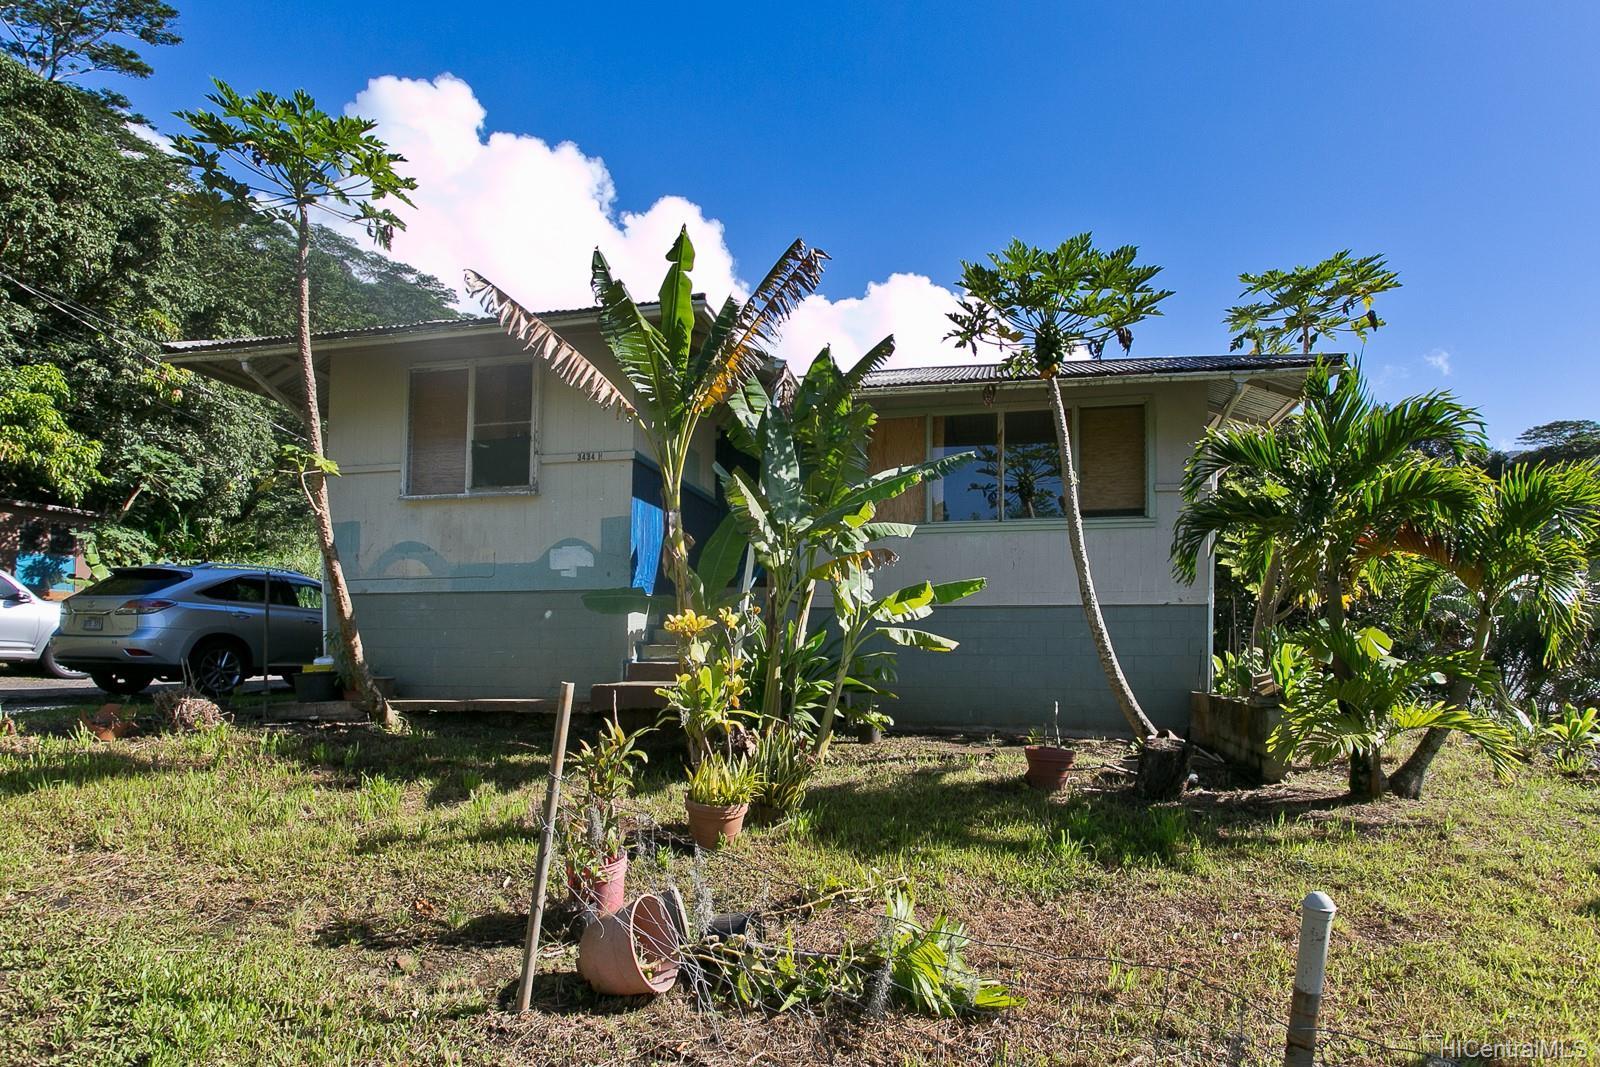 3434 Kalihi Street Honolulu - Multi-family - photo 11 of 20